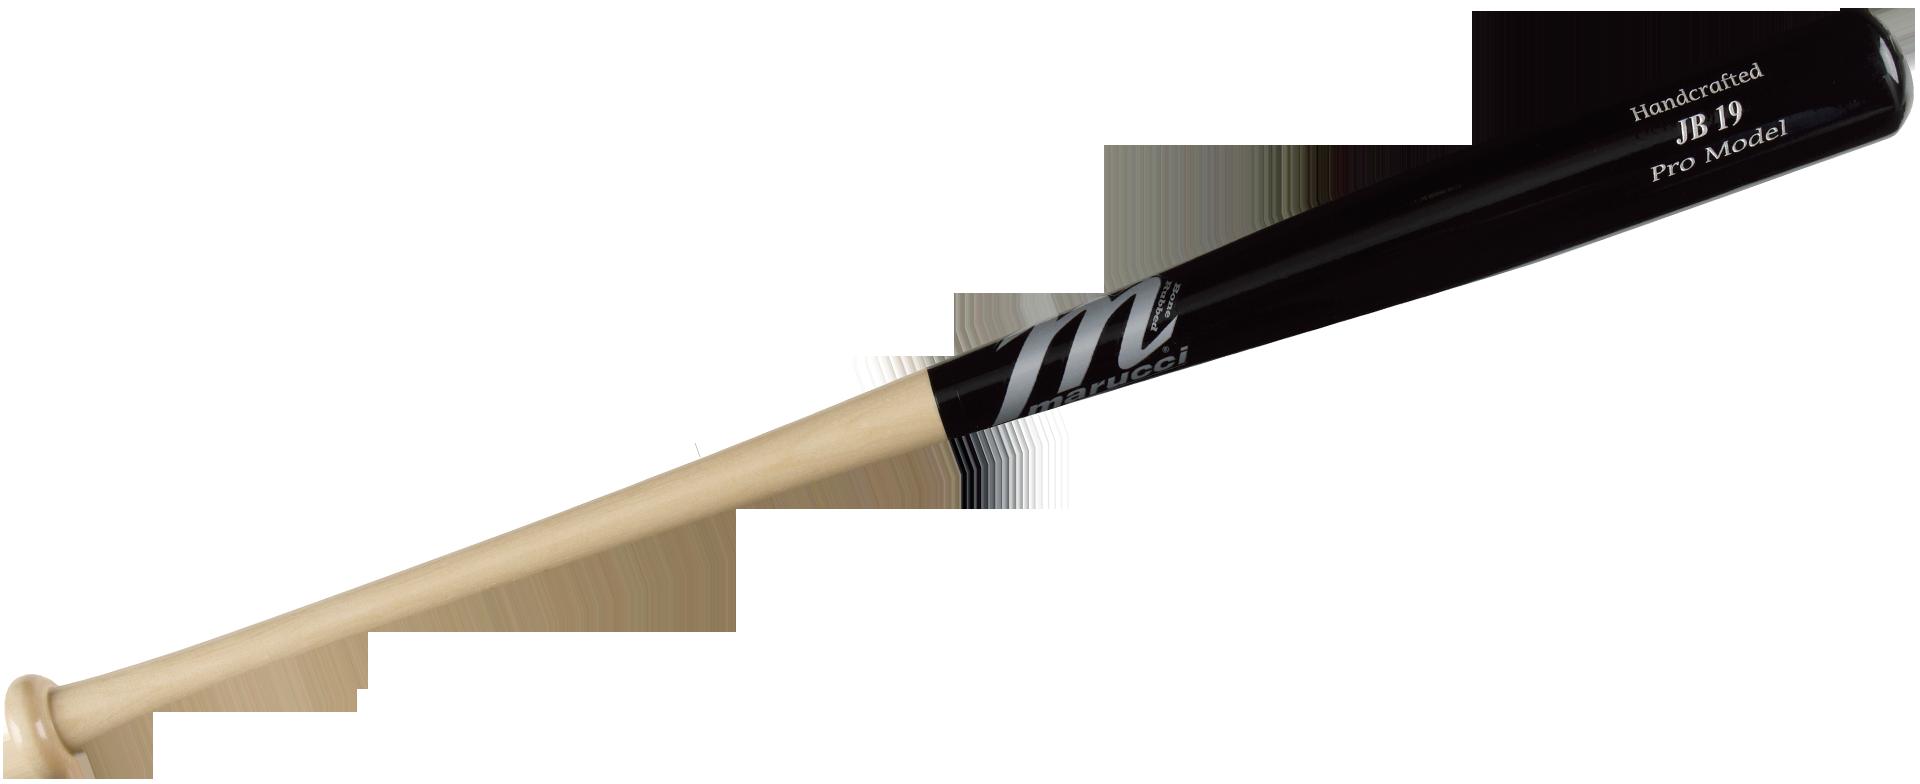 Wooden bat clipart graphic free JB19 Maple Pro Model Baseball Bat | Wood Bats - Clipart ... graphic free